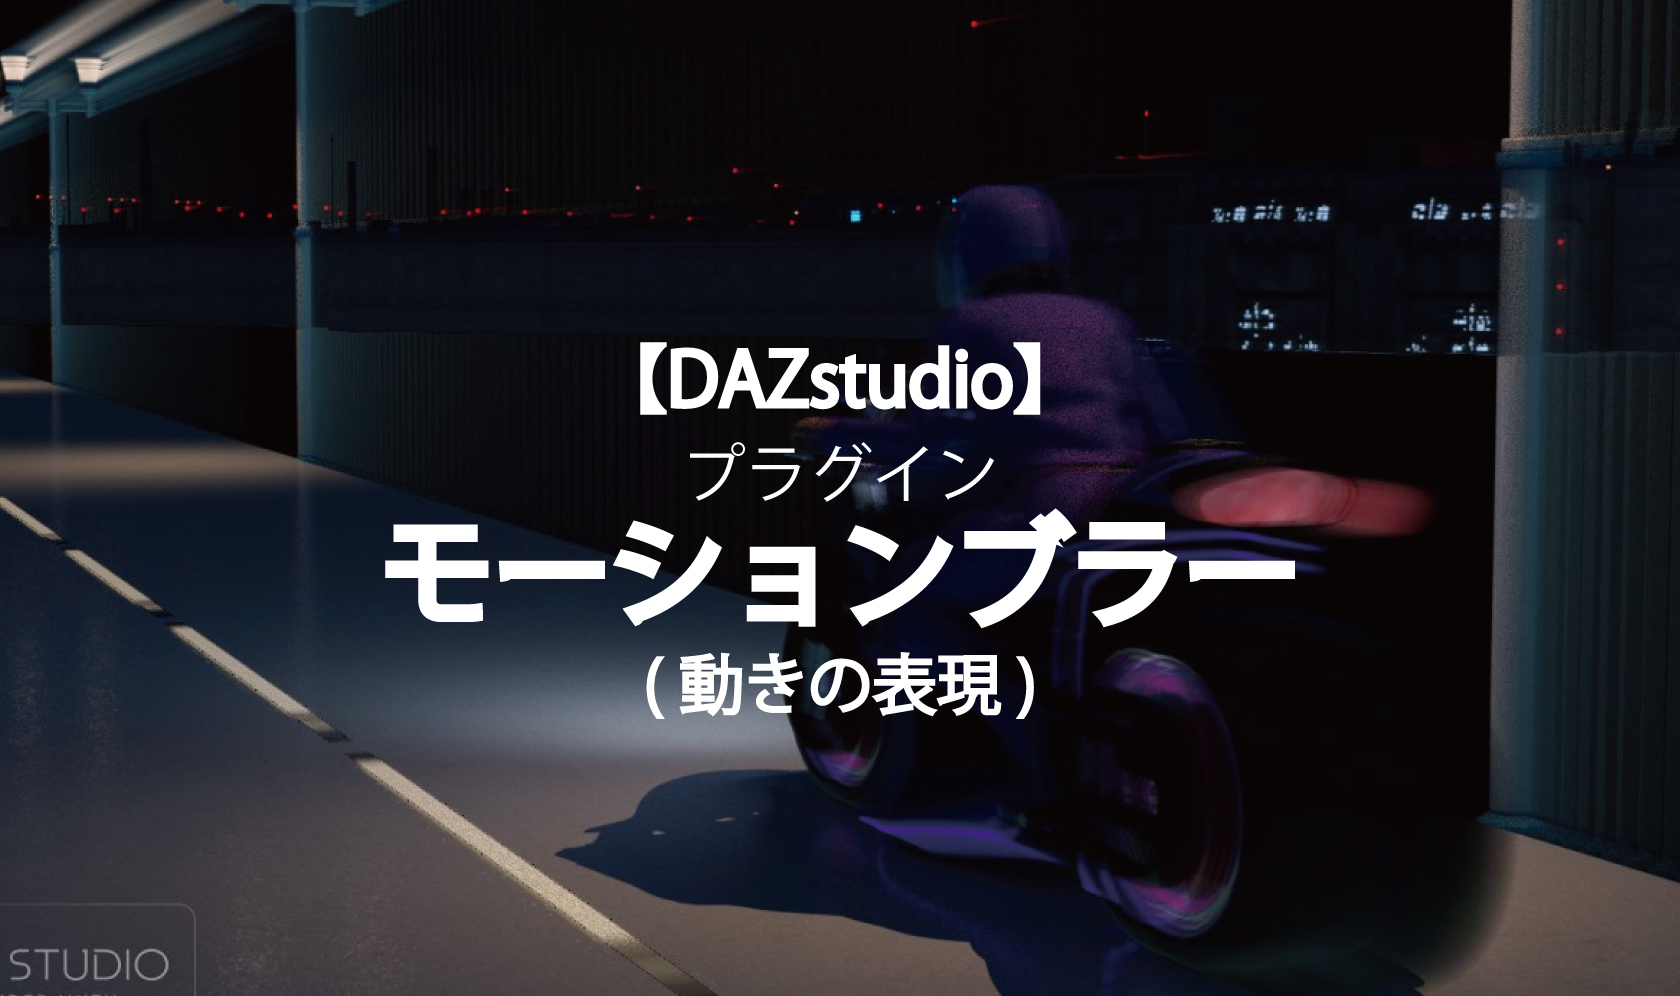 【DAZstudio】モーションブラーのプラグイン